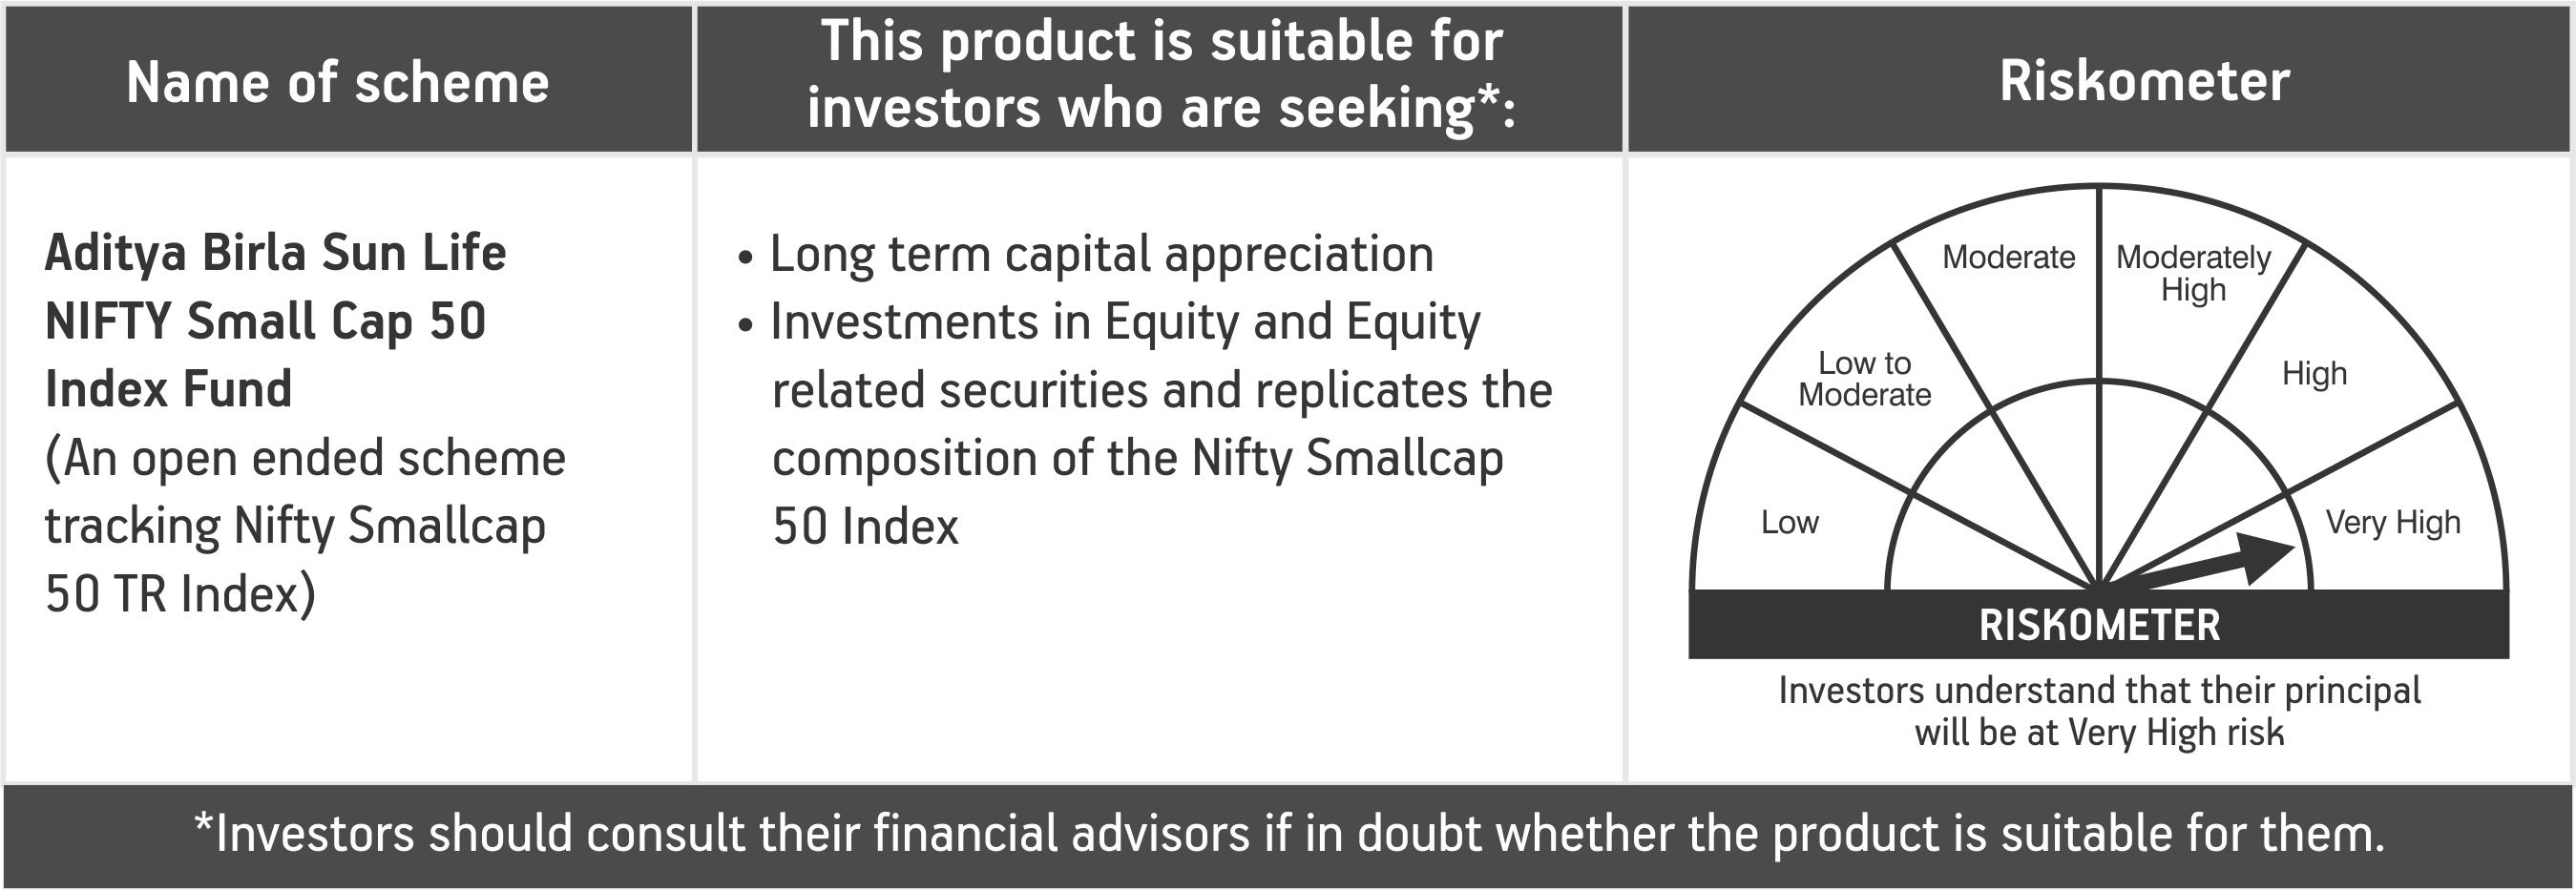 Nifty Small Cap Index Fund Riskometer